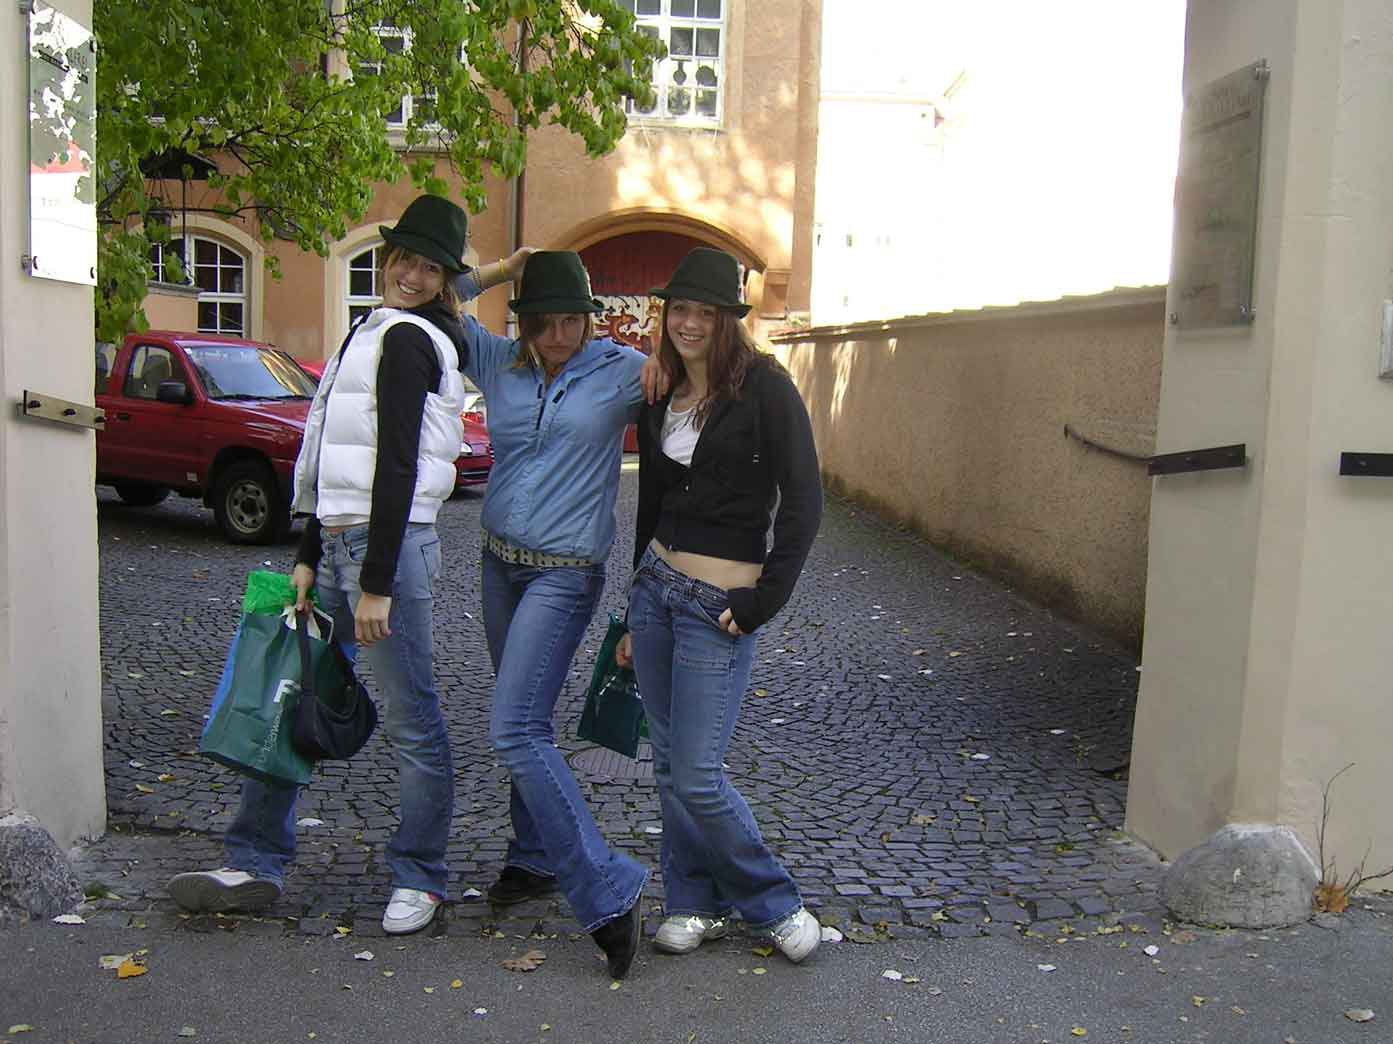 showin off our austrian hats...